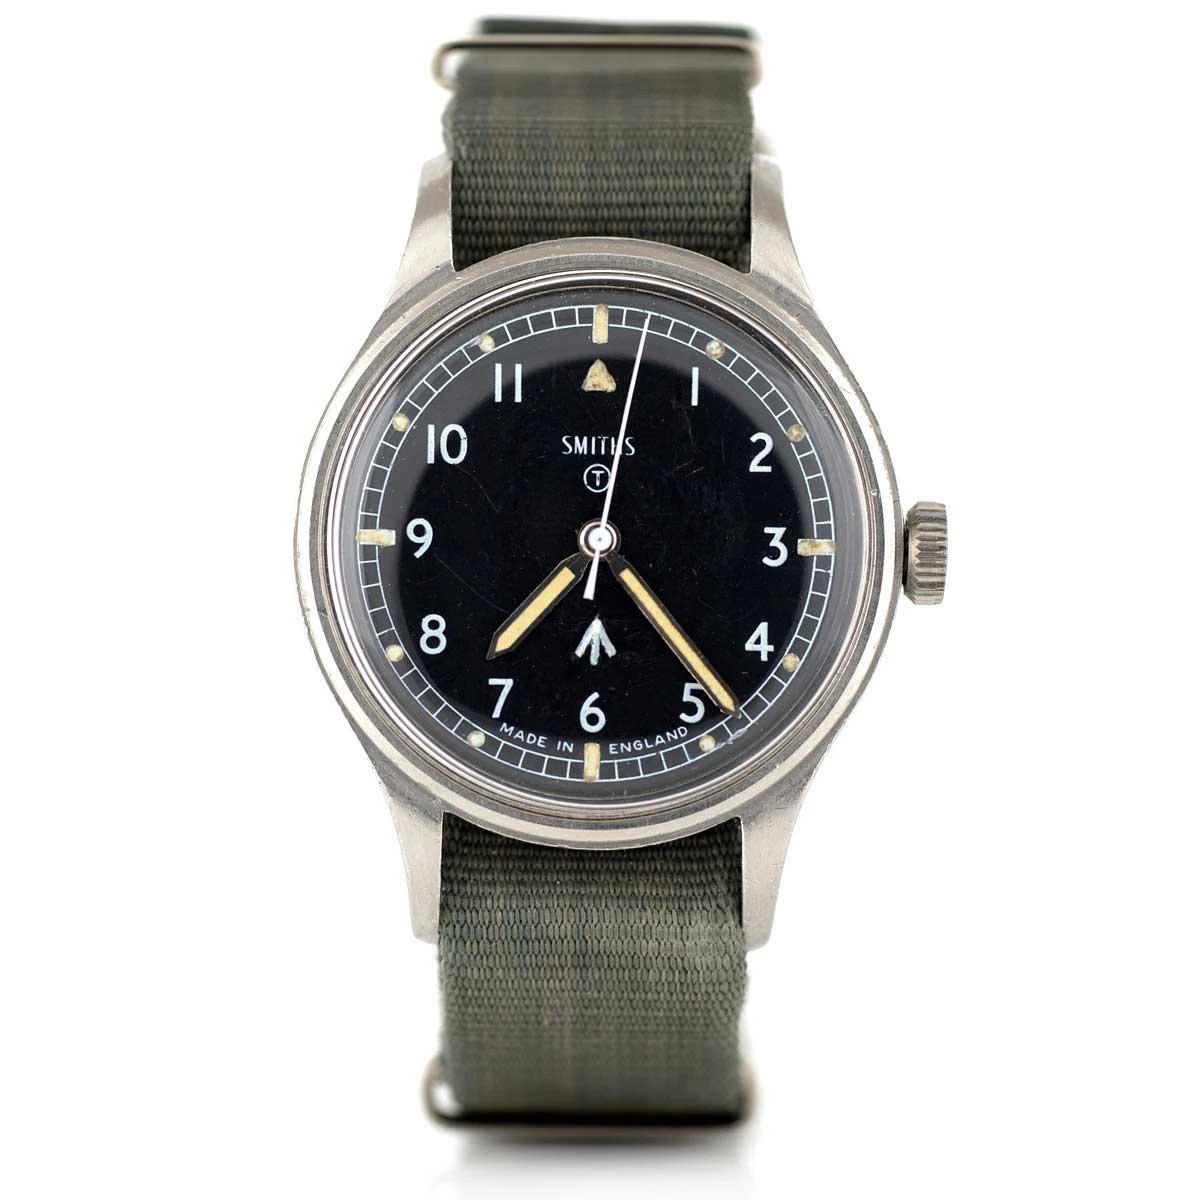 Smiths W10 (Image: Mr Jones Watches)